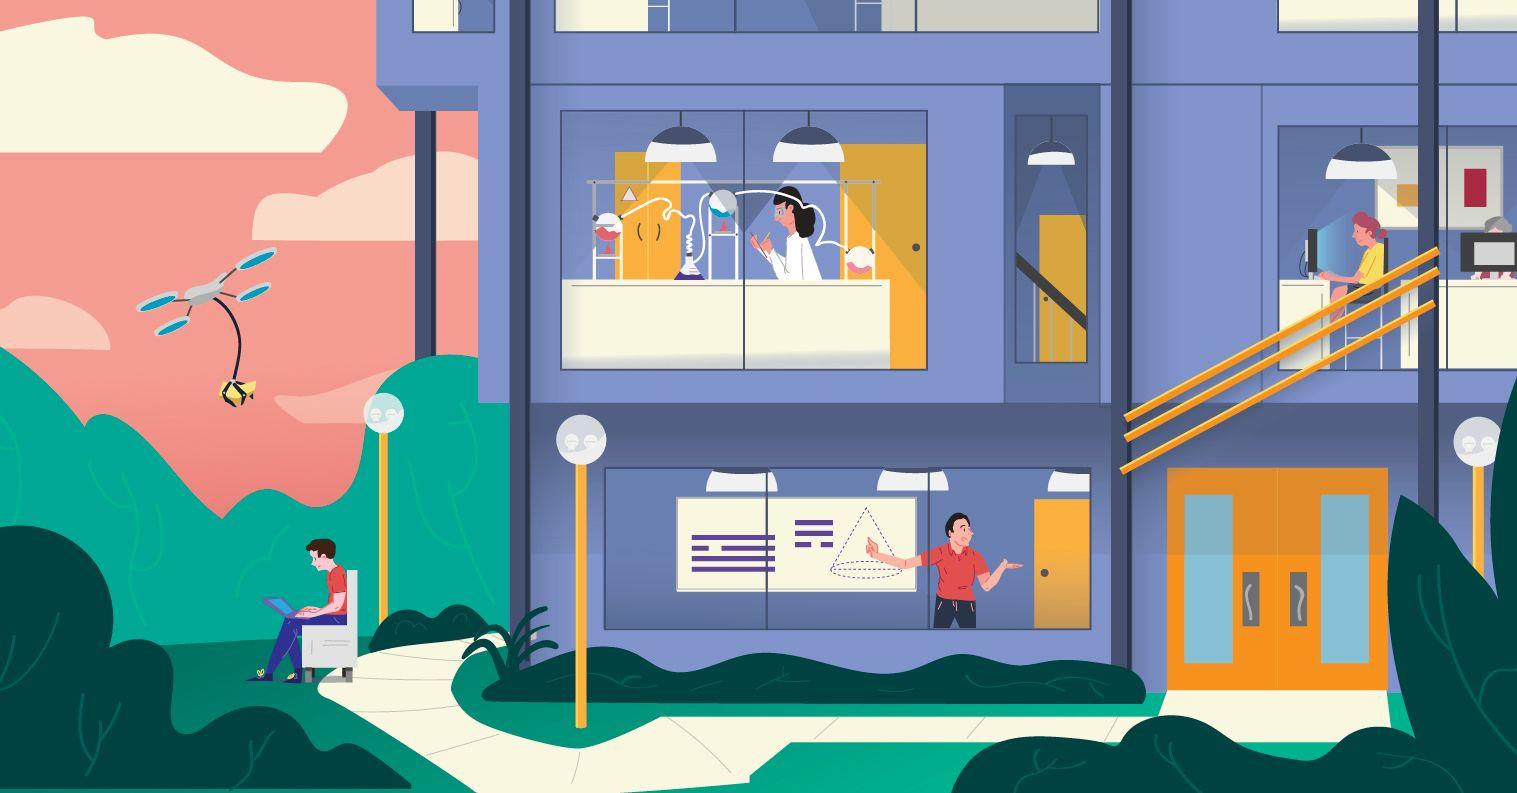 image: futuristic school